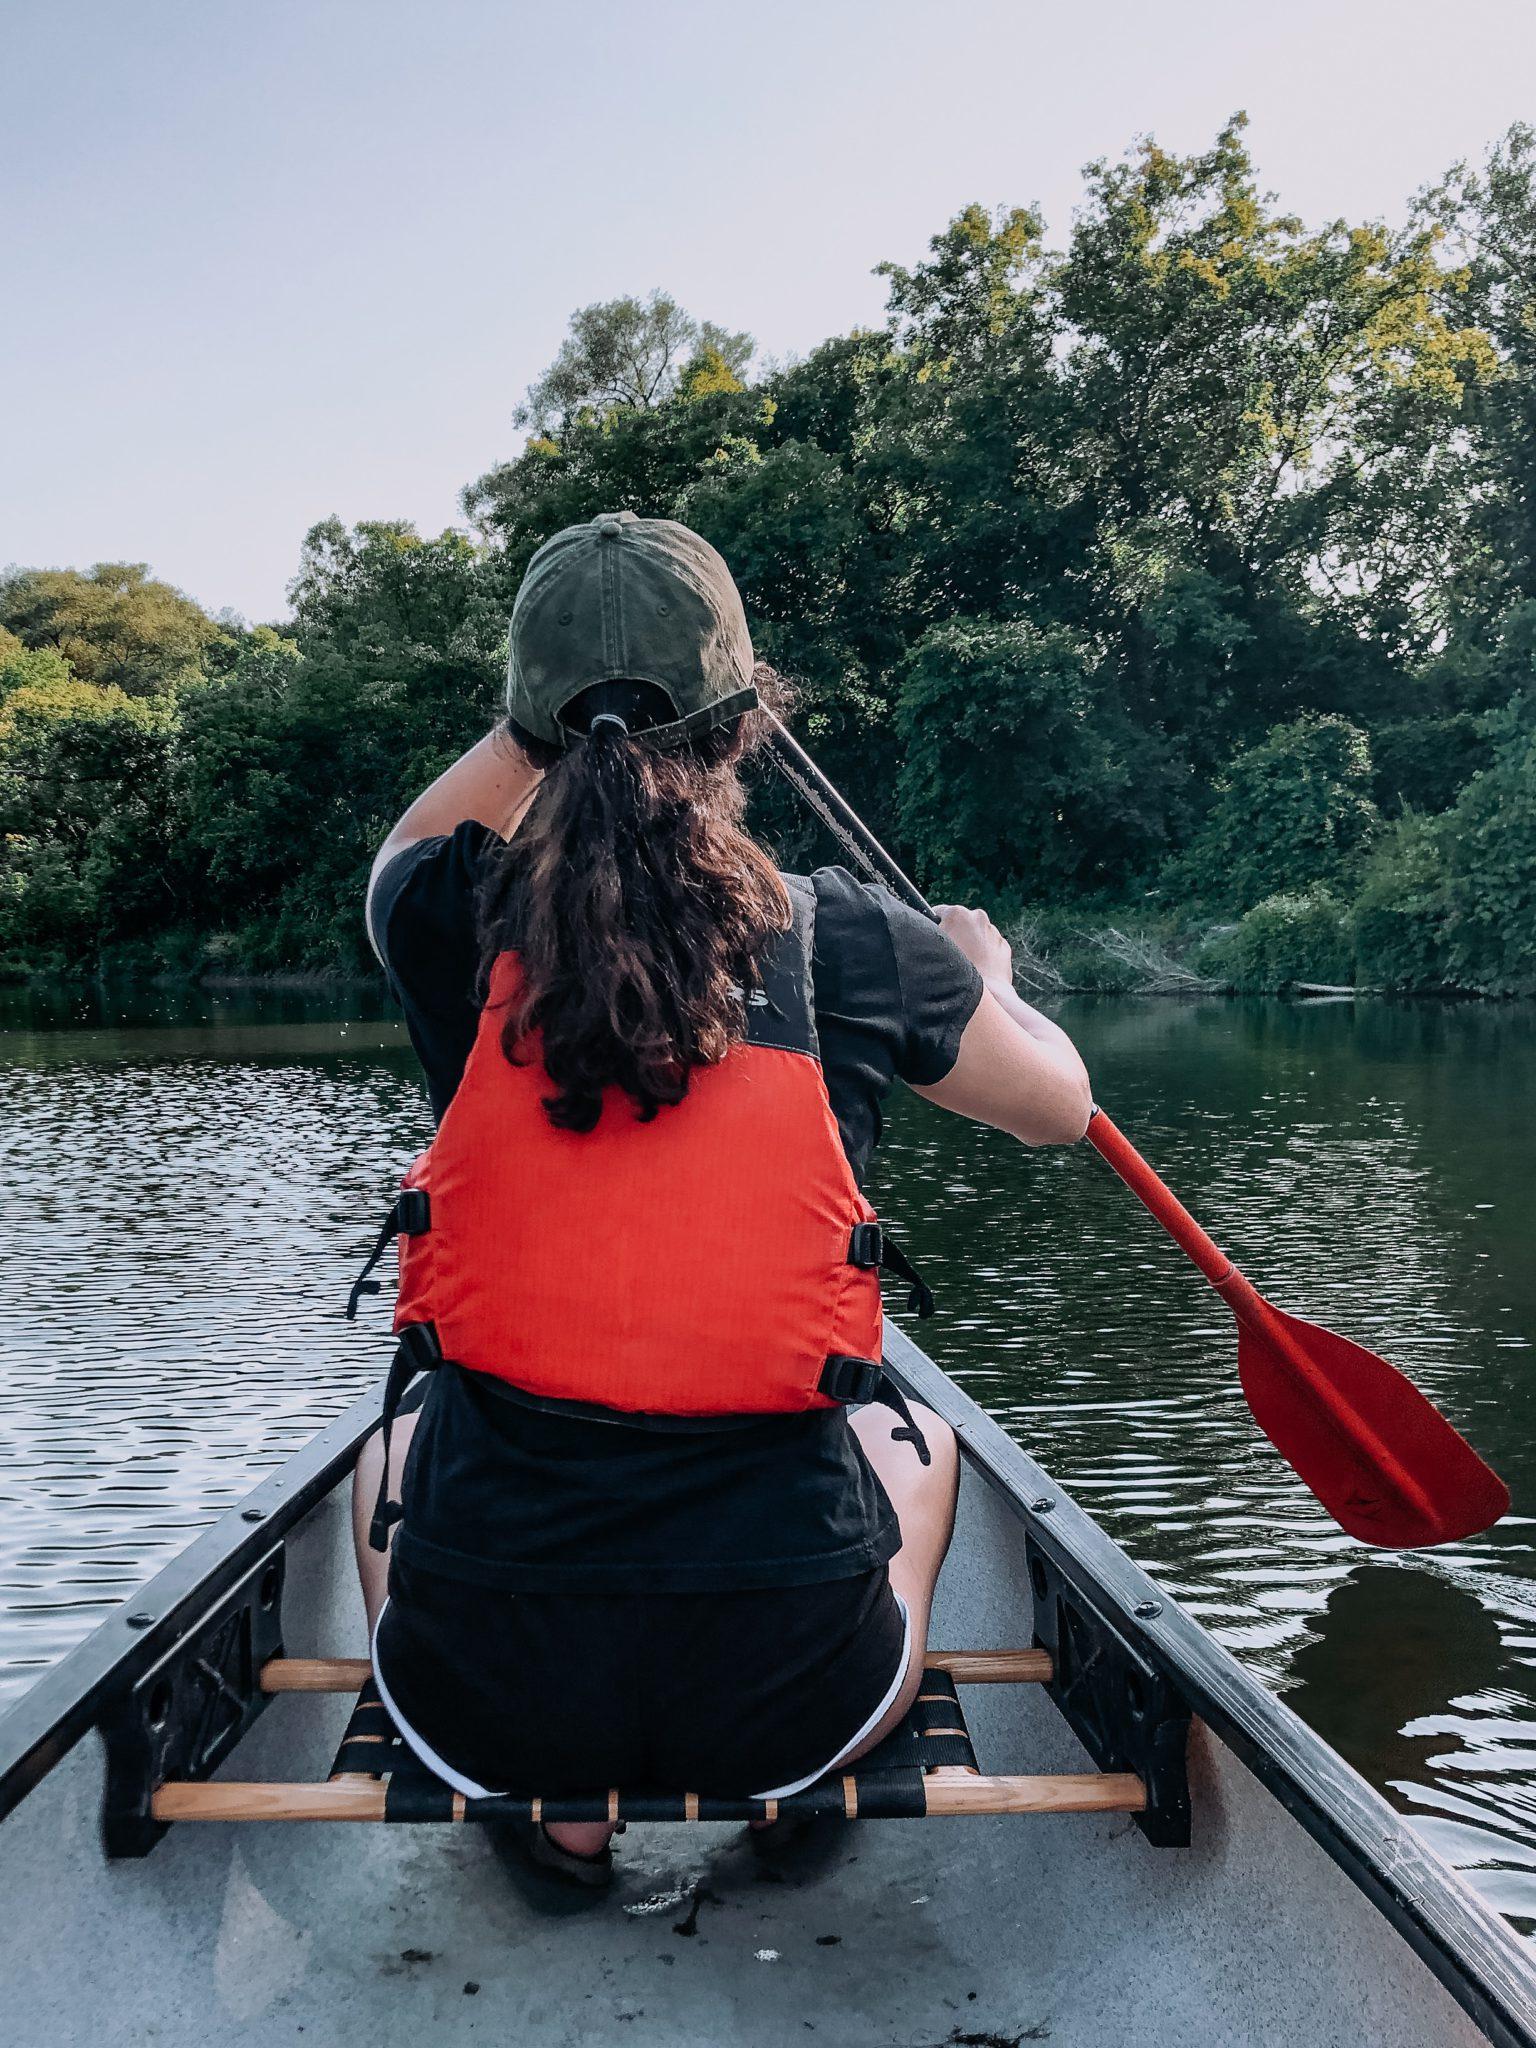 Private River Dart canoeing experience in Totnes, Devon